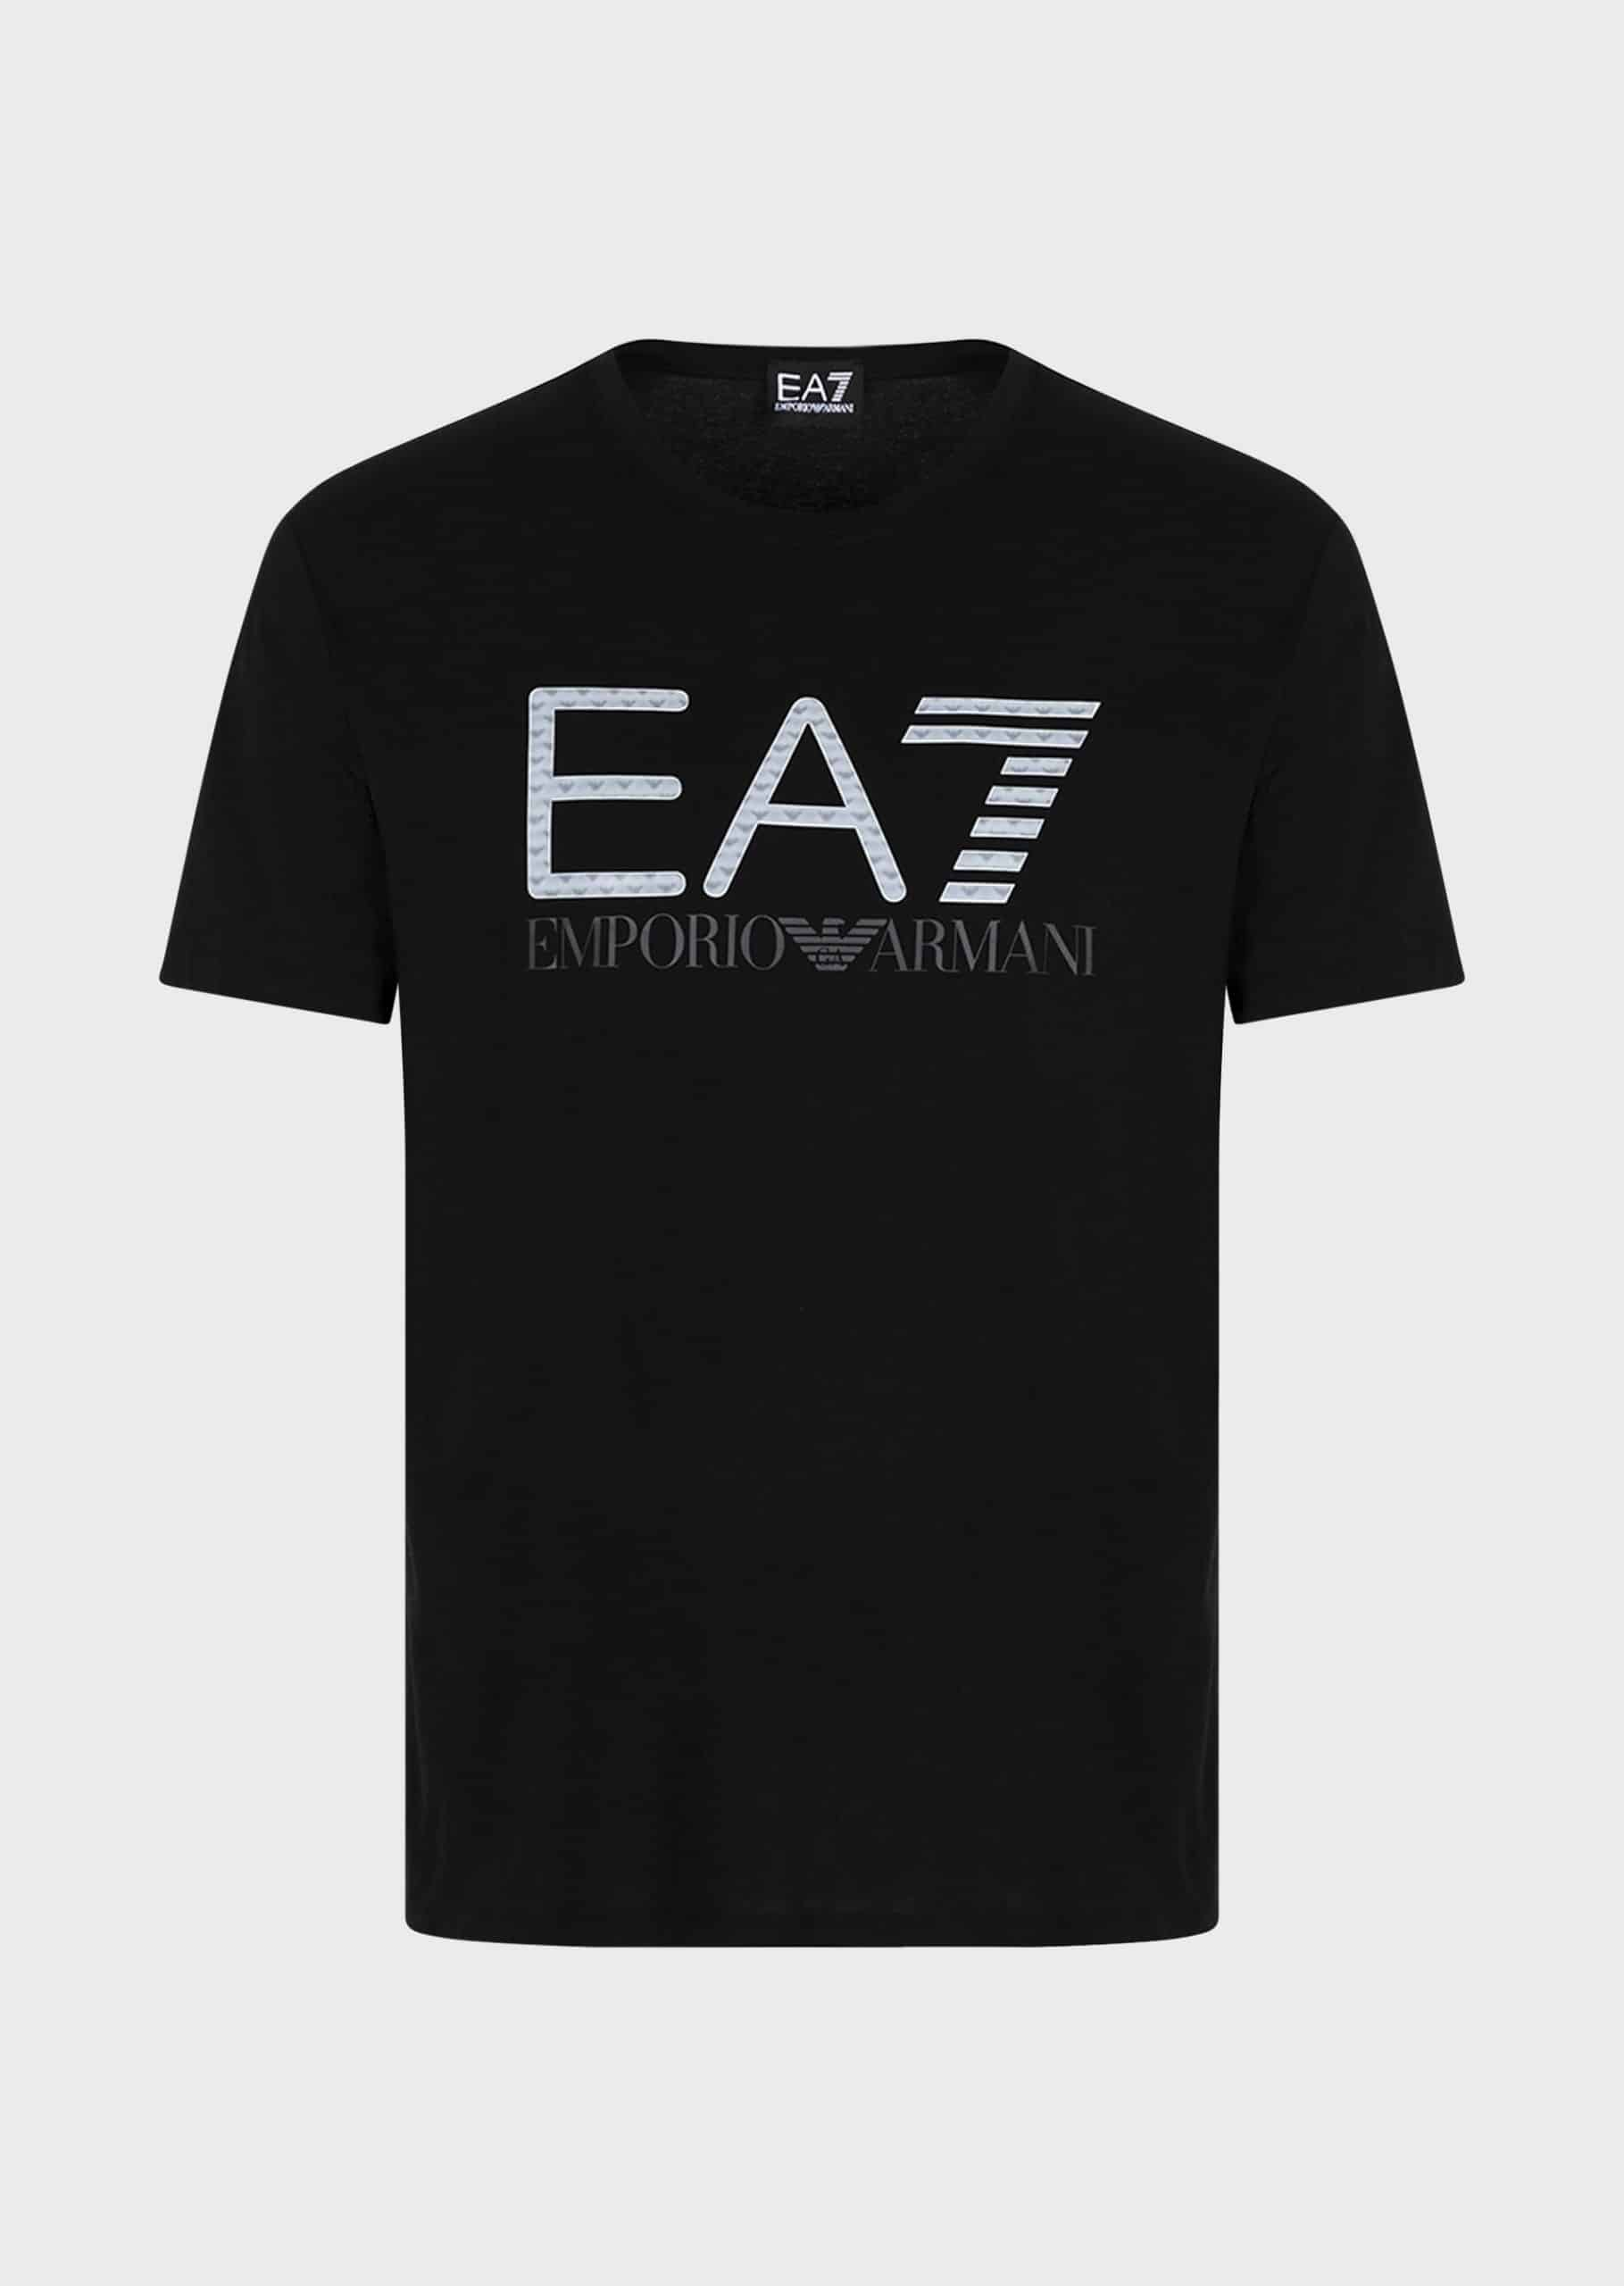 Armani EA7 T-Shirt 3D Logo Print Black